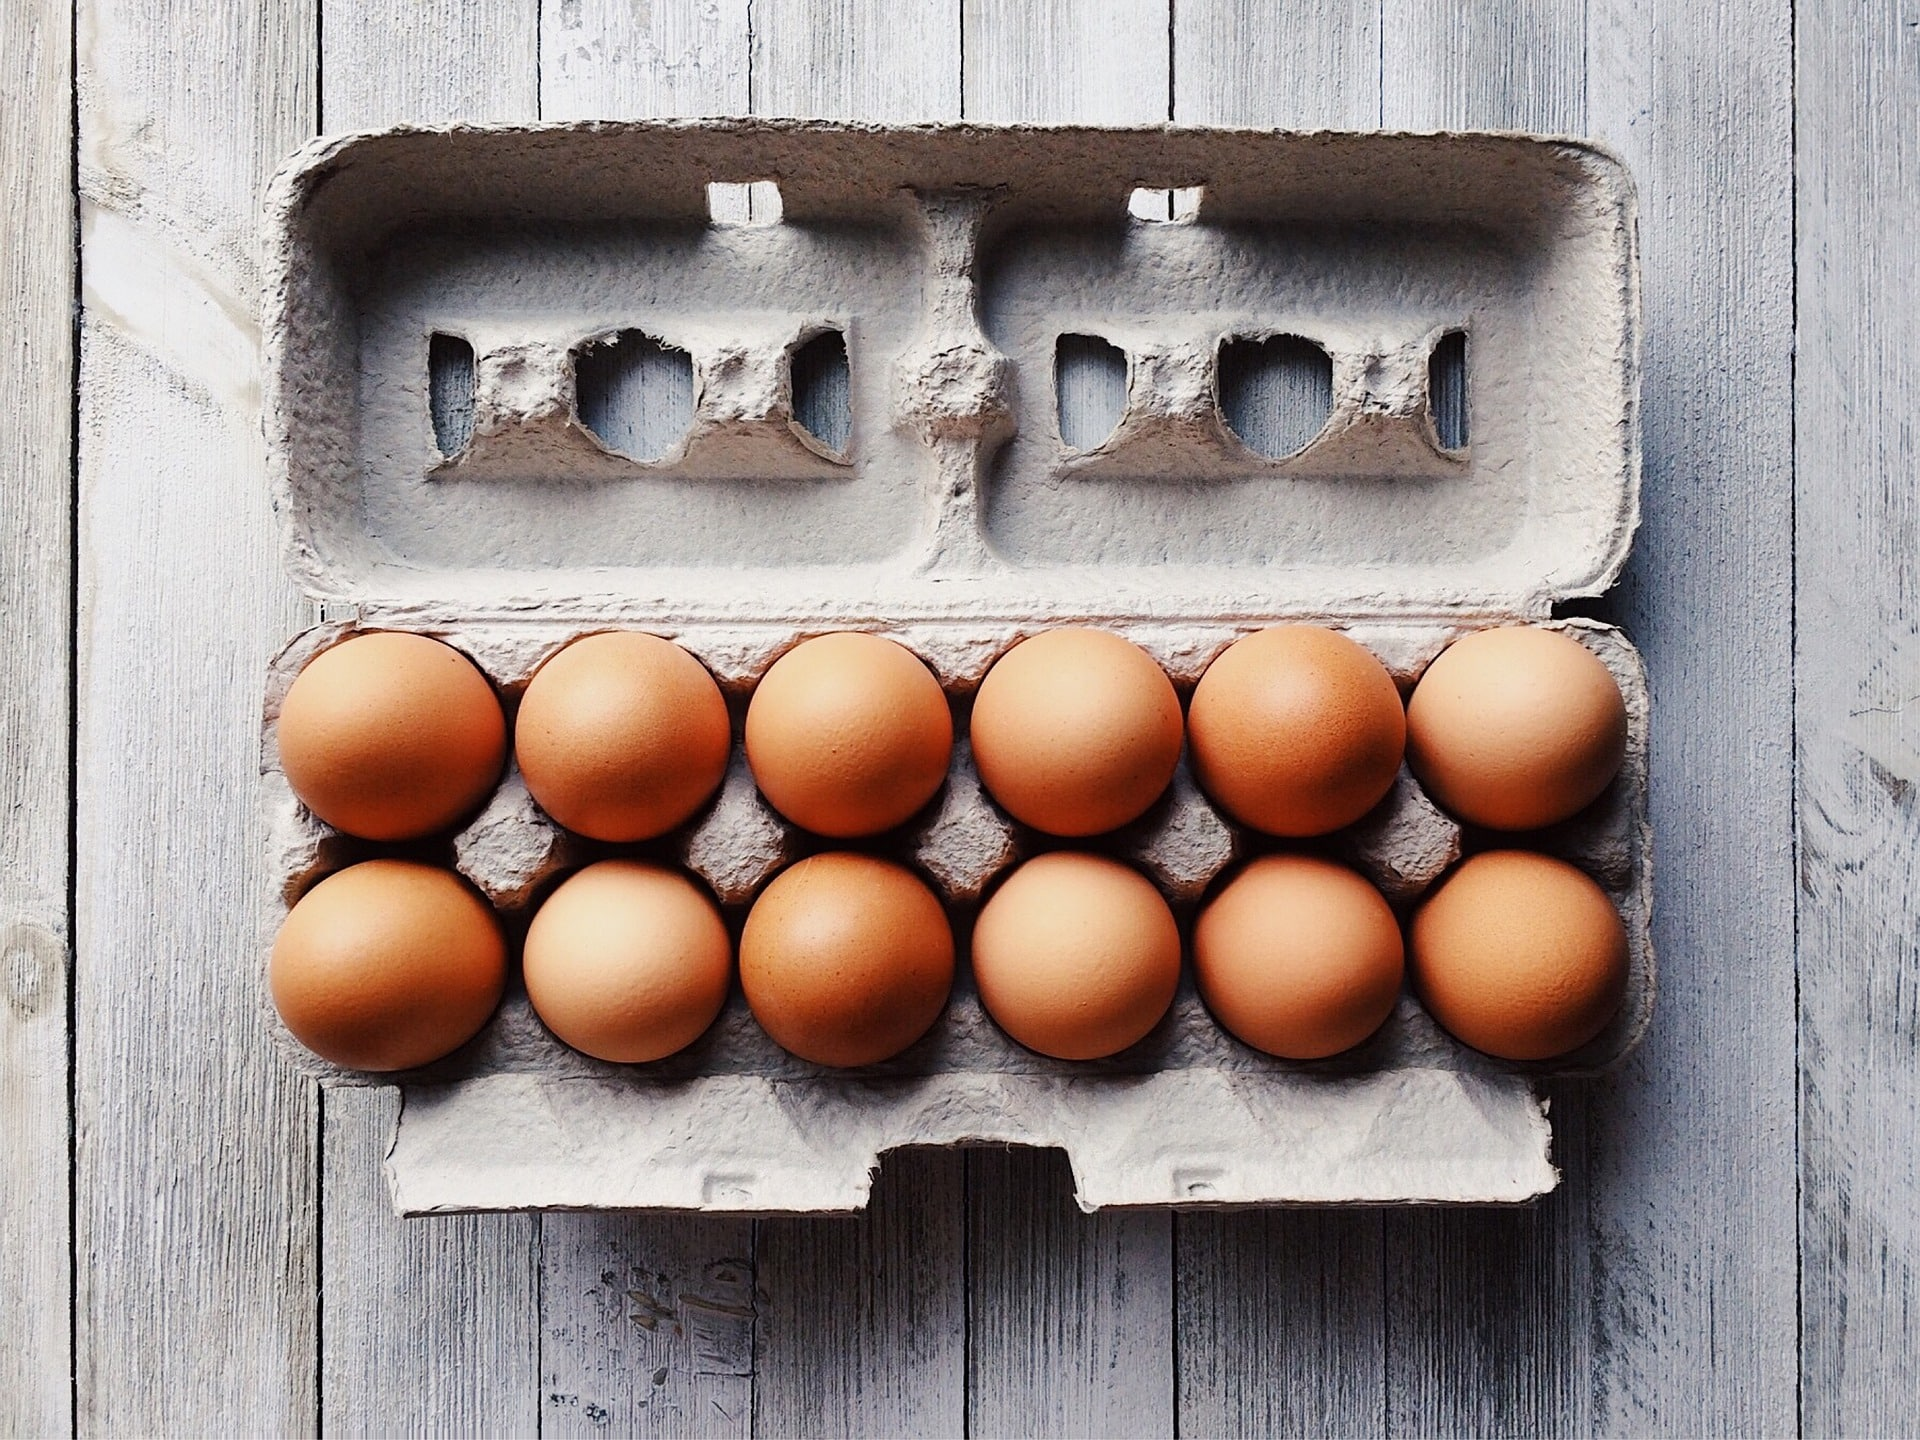 Foods for hypothyroidism - eggs